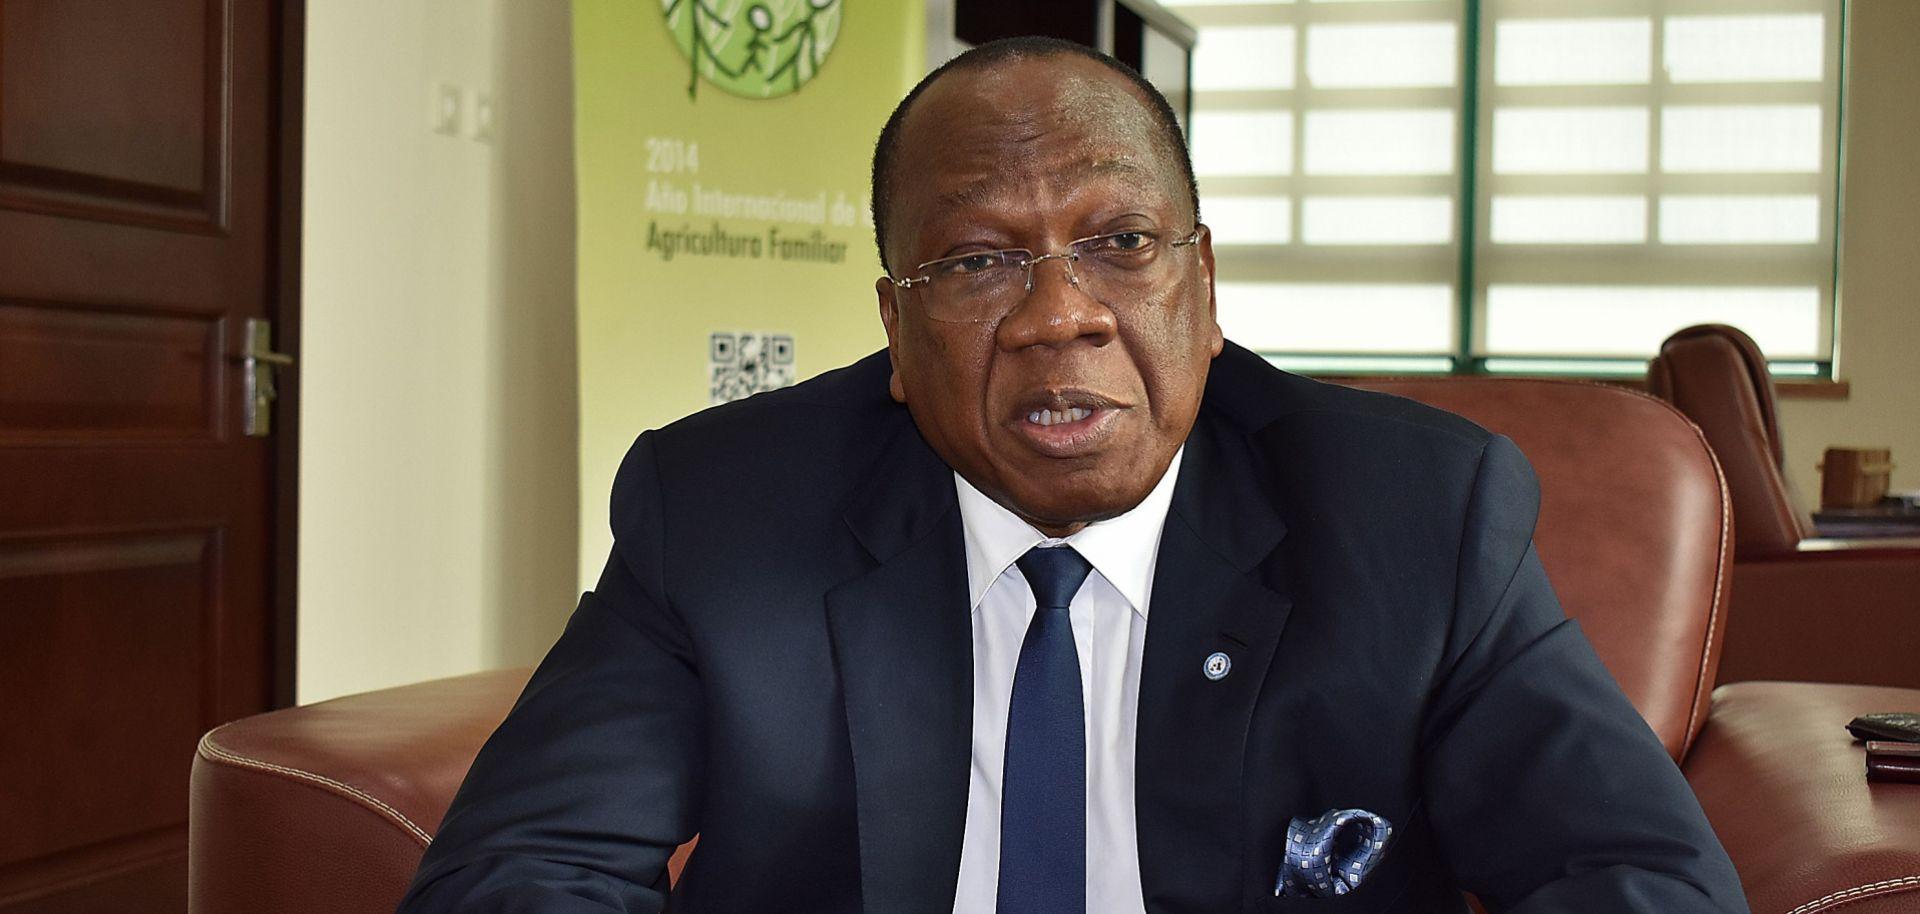 U.N. envoy Francois Lounceny Fall speaks in Malabo, the capital of Equatorial Guinea, on Jan. 9, 2018.